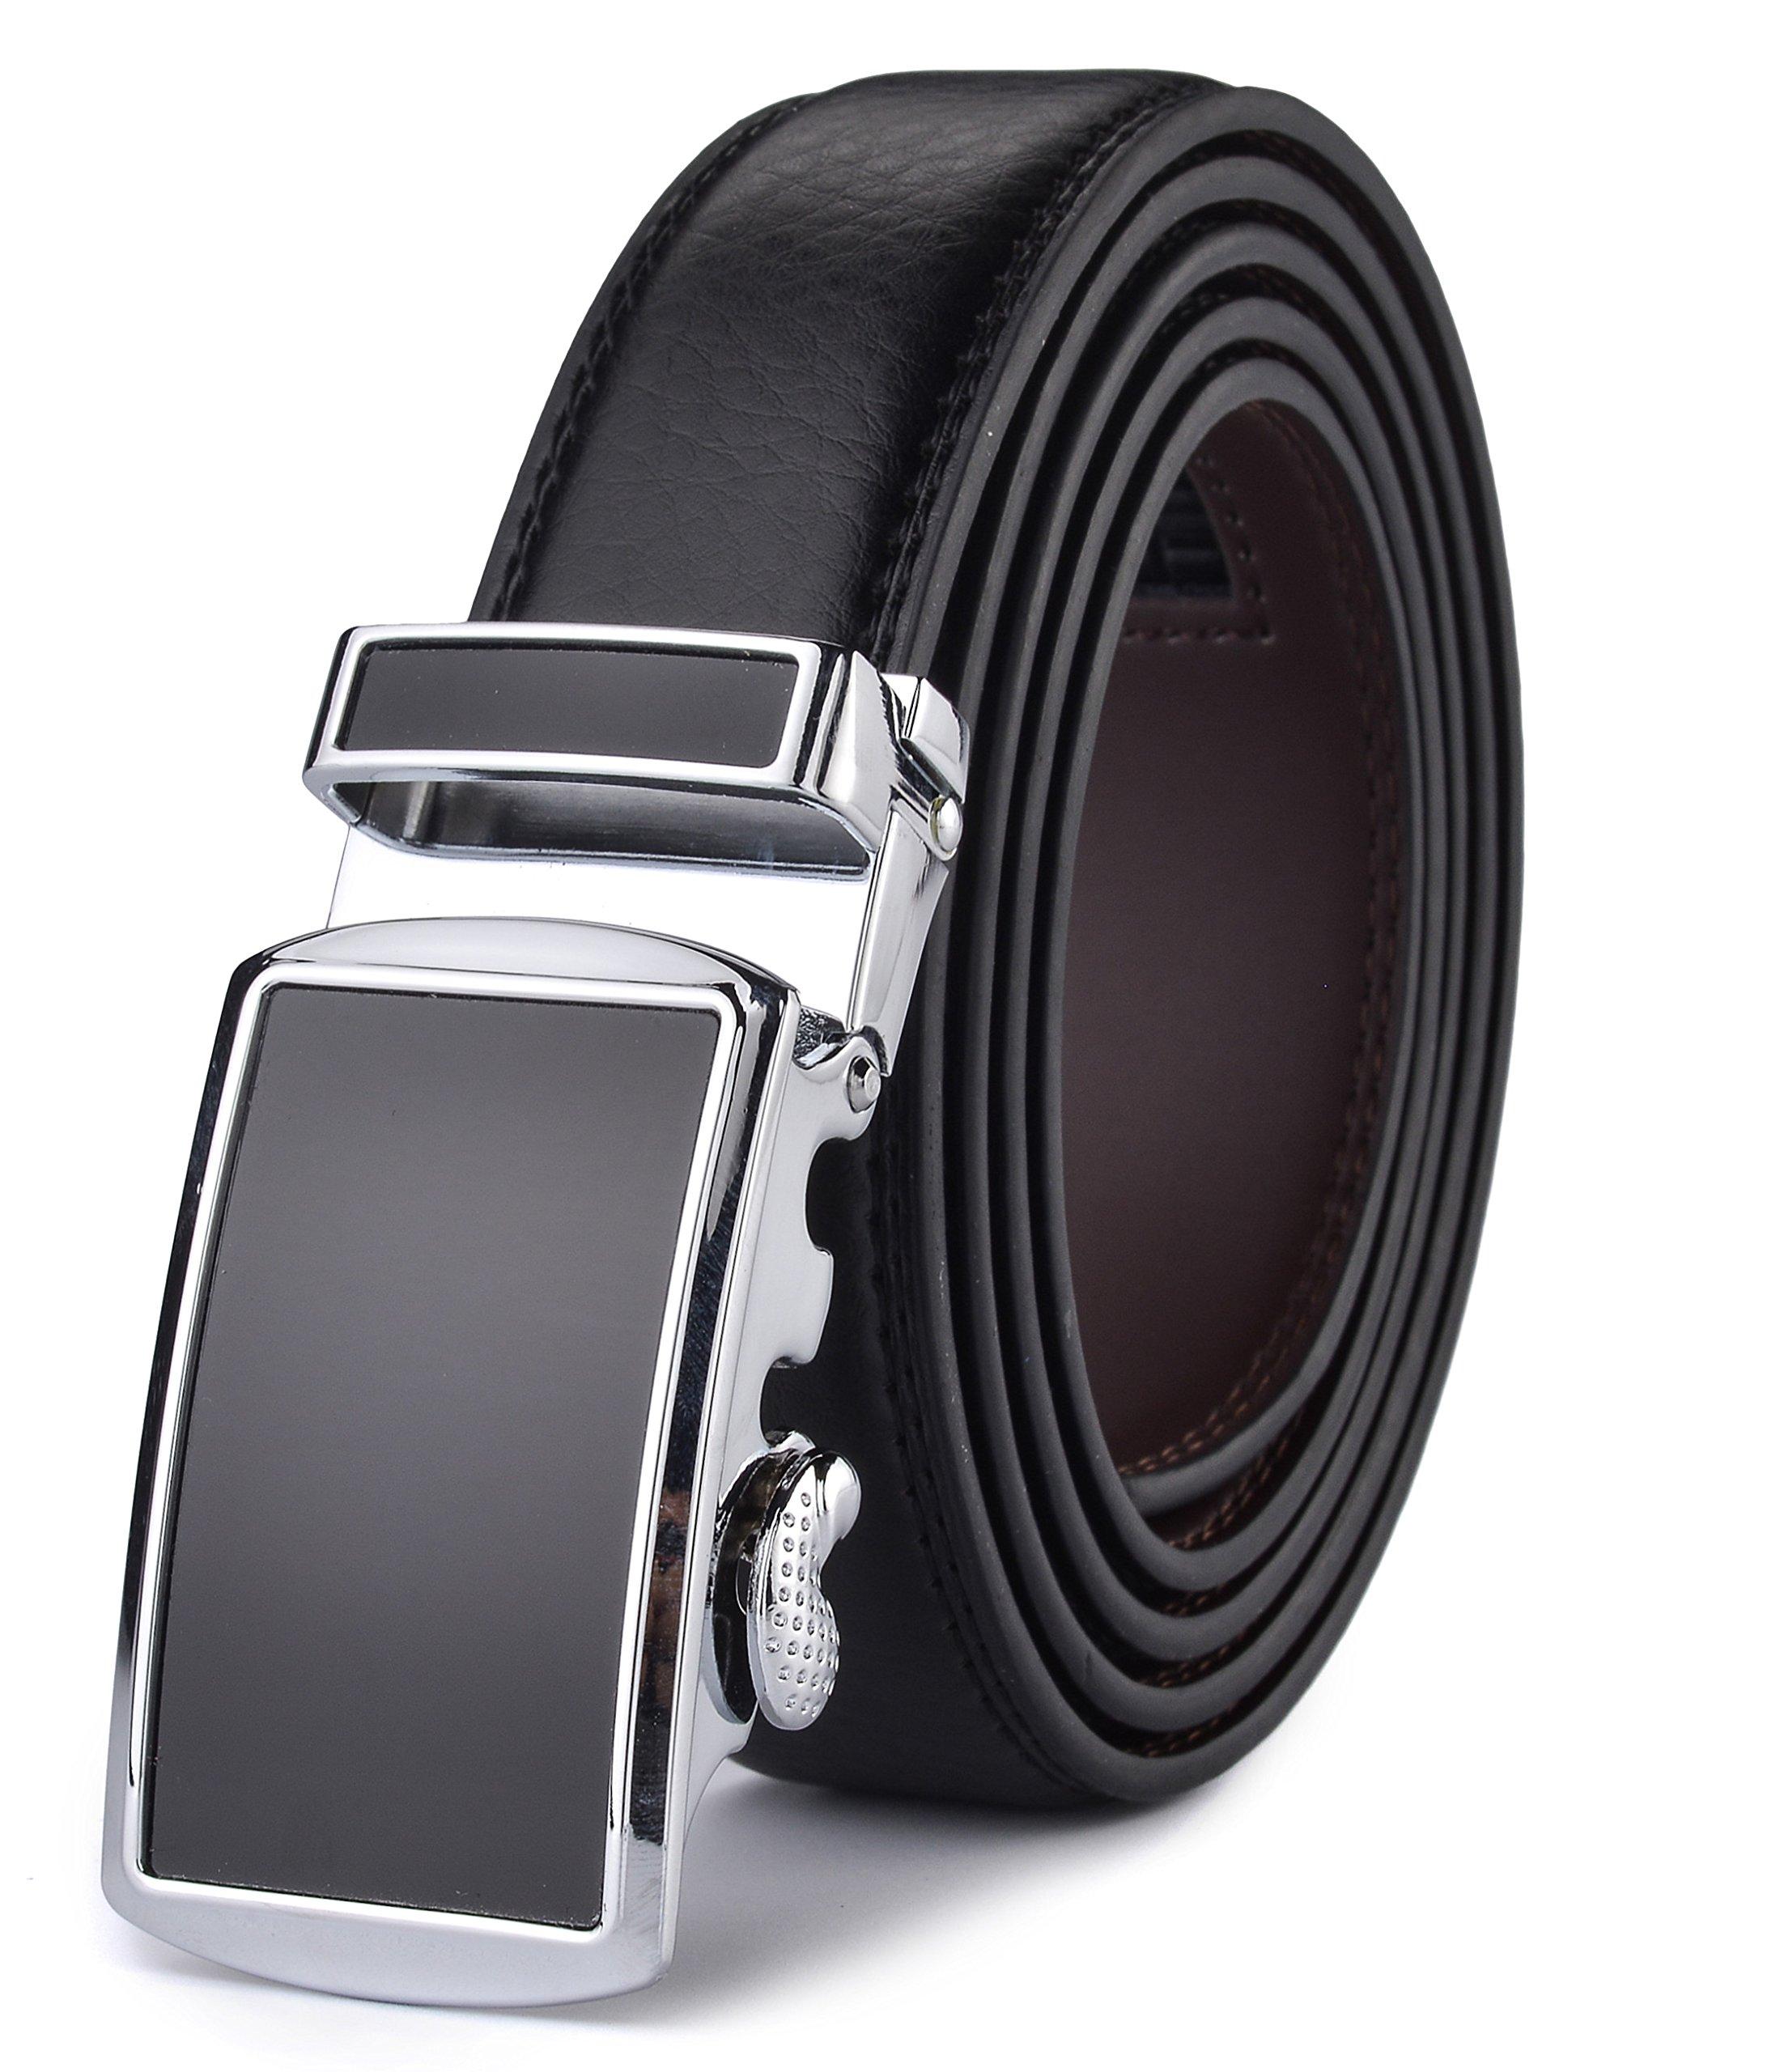 Men's Belt,HW Zone Automatic Slide Ratchet Belt for Men with Genuine Leather 1 1/8,Trim to Fit